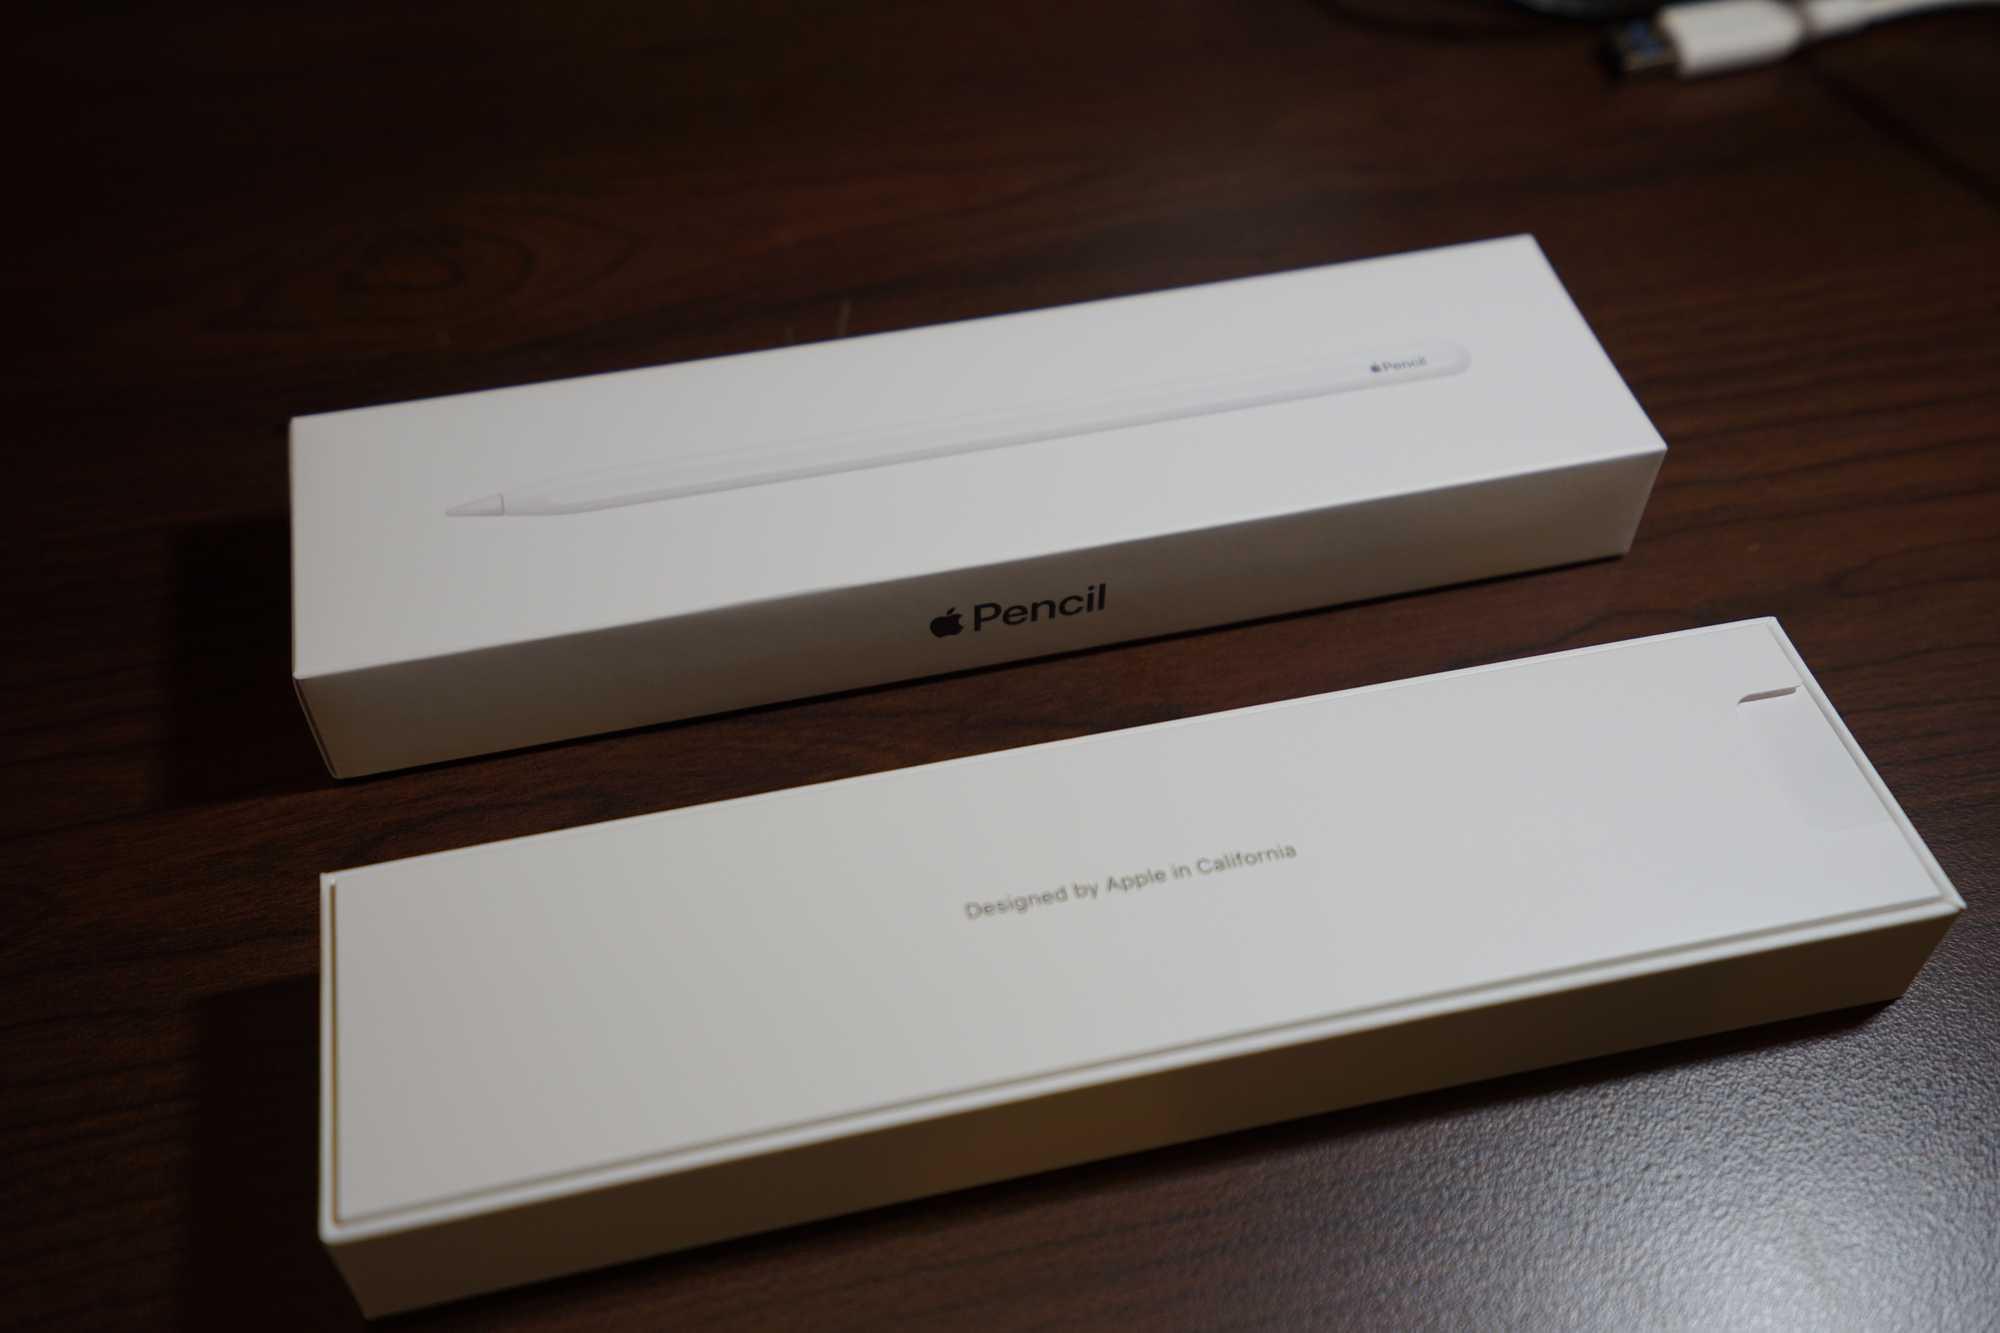 Inside Apple Pencil Box